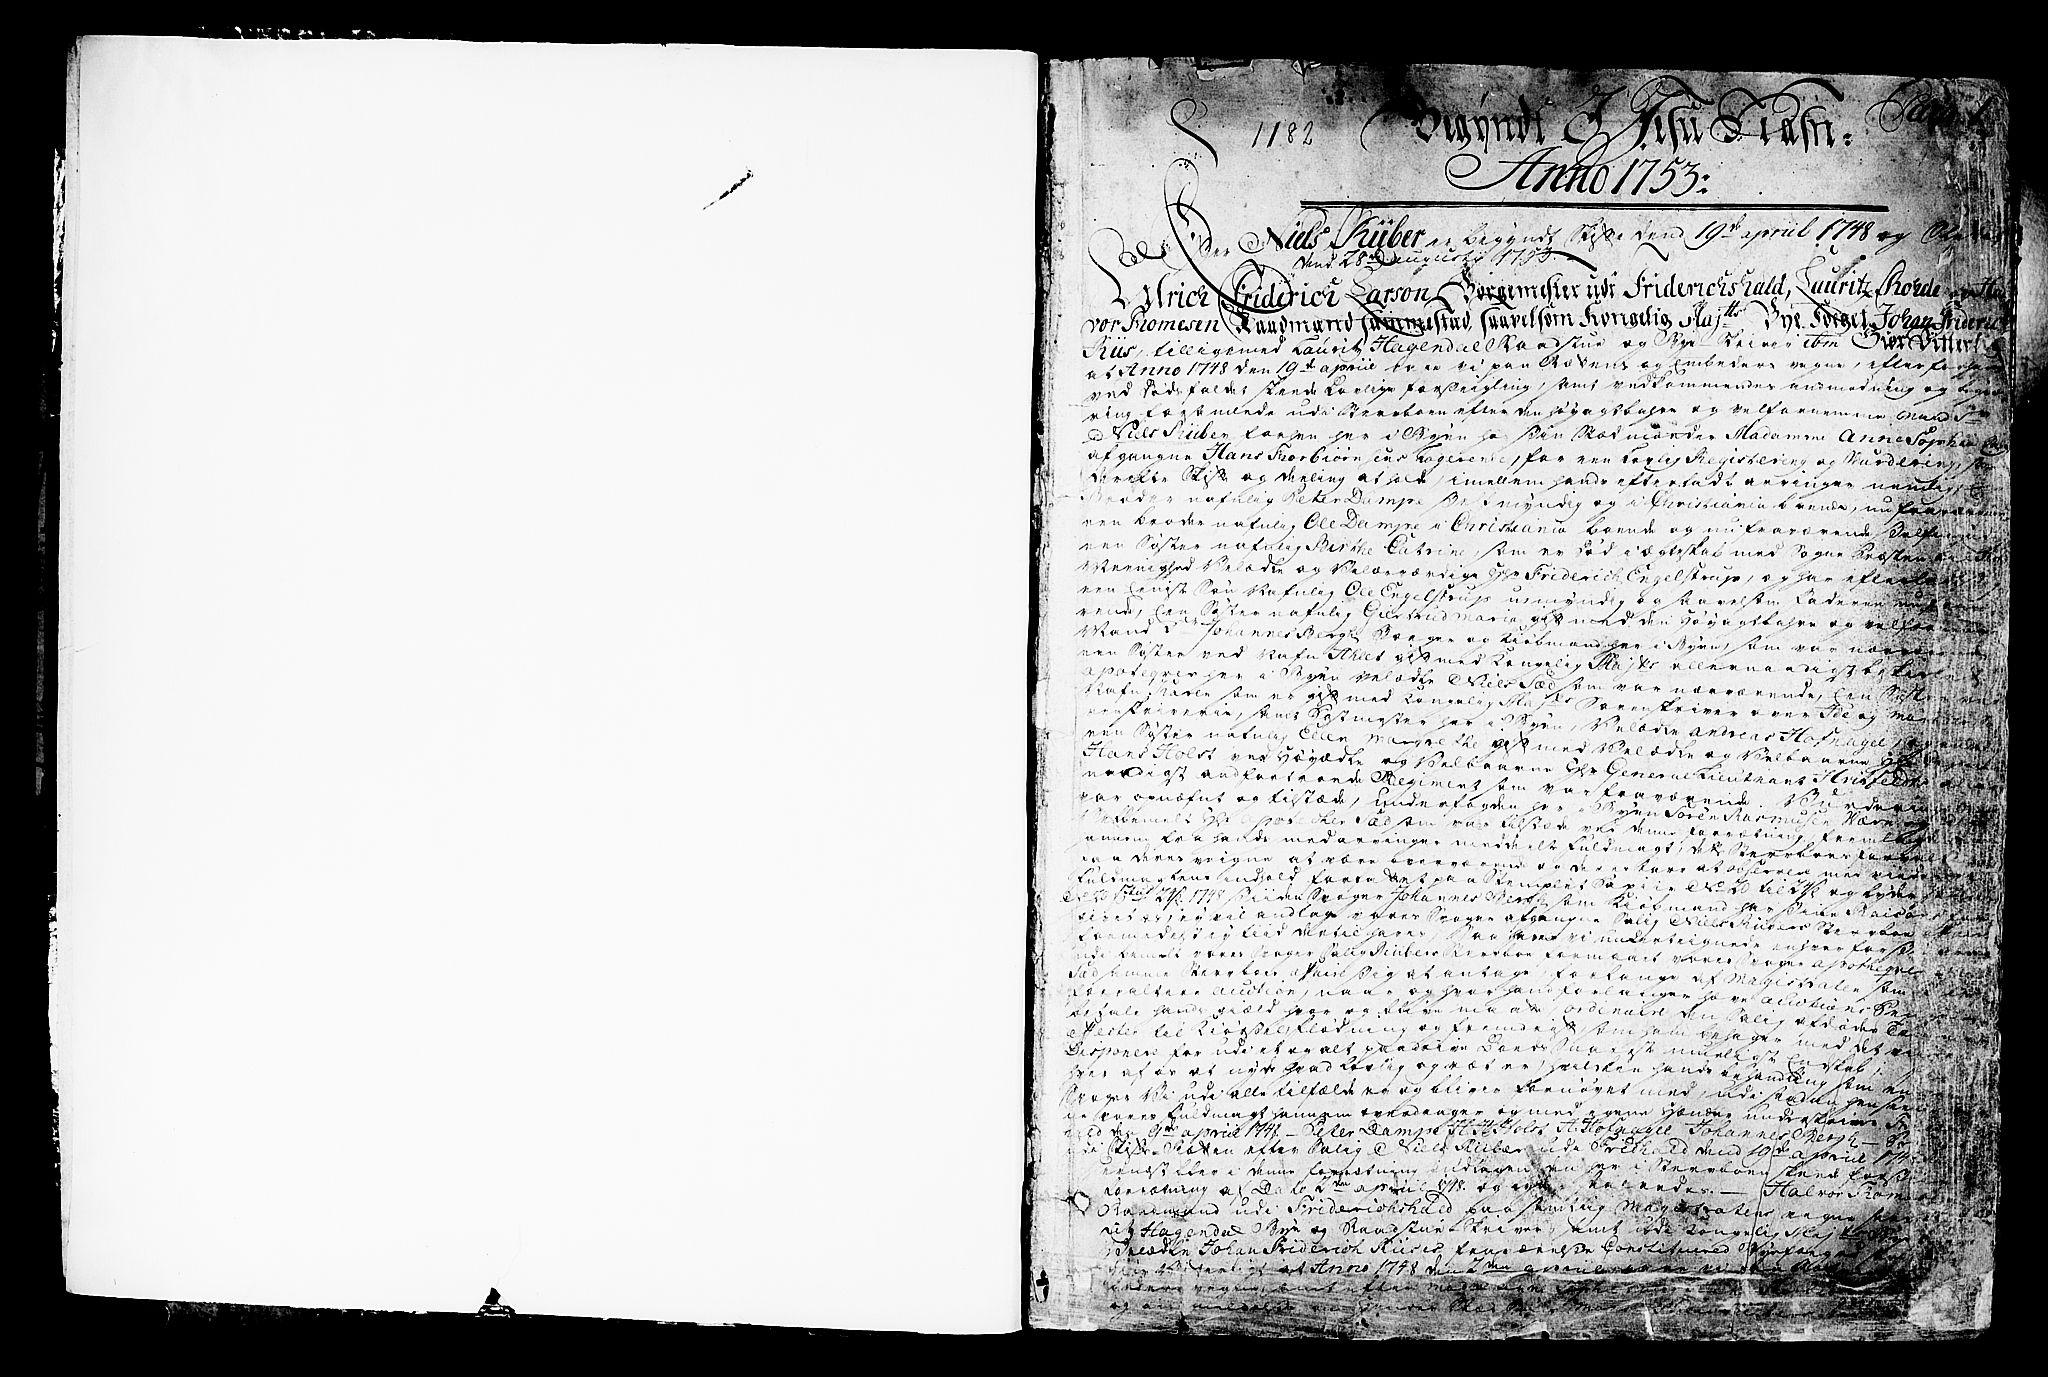 SAO, Halden byfogd, H/Hc/L0003: Skifteprotokoll, 1753-1766, s. 0-1